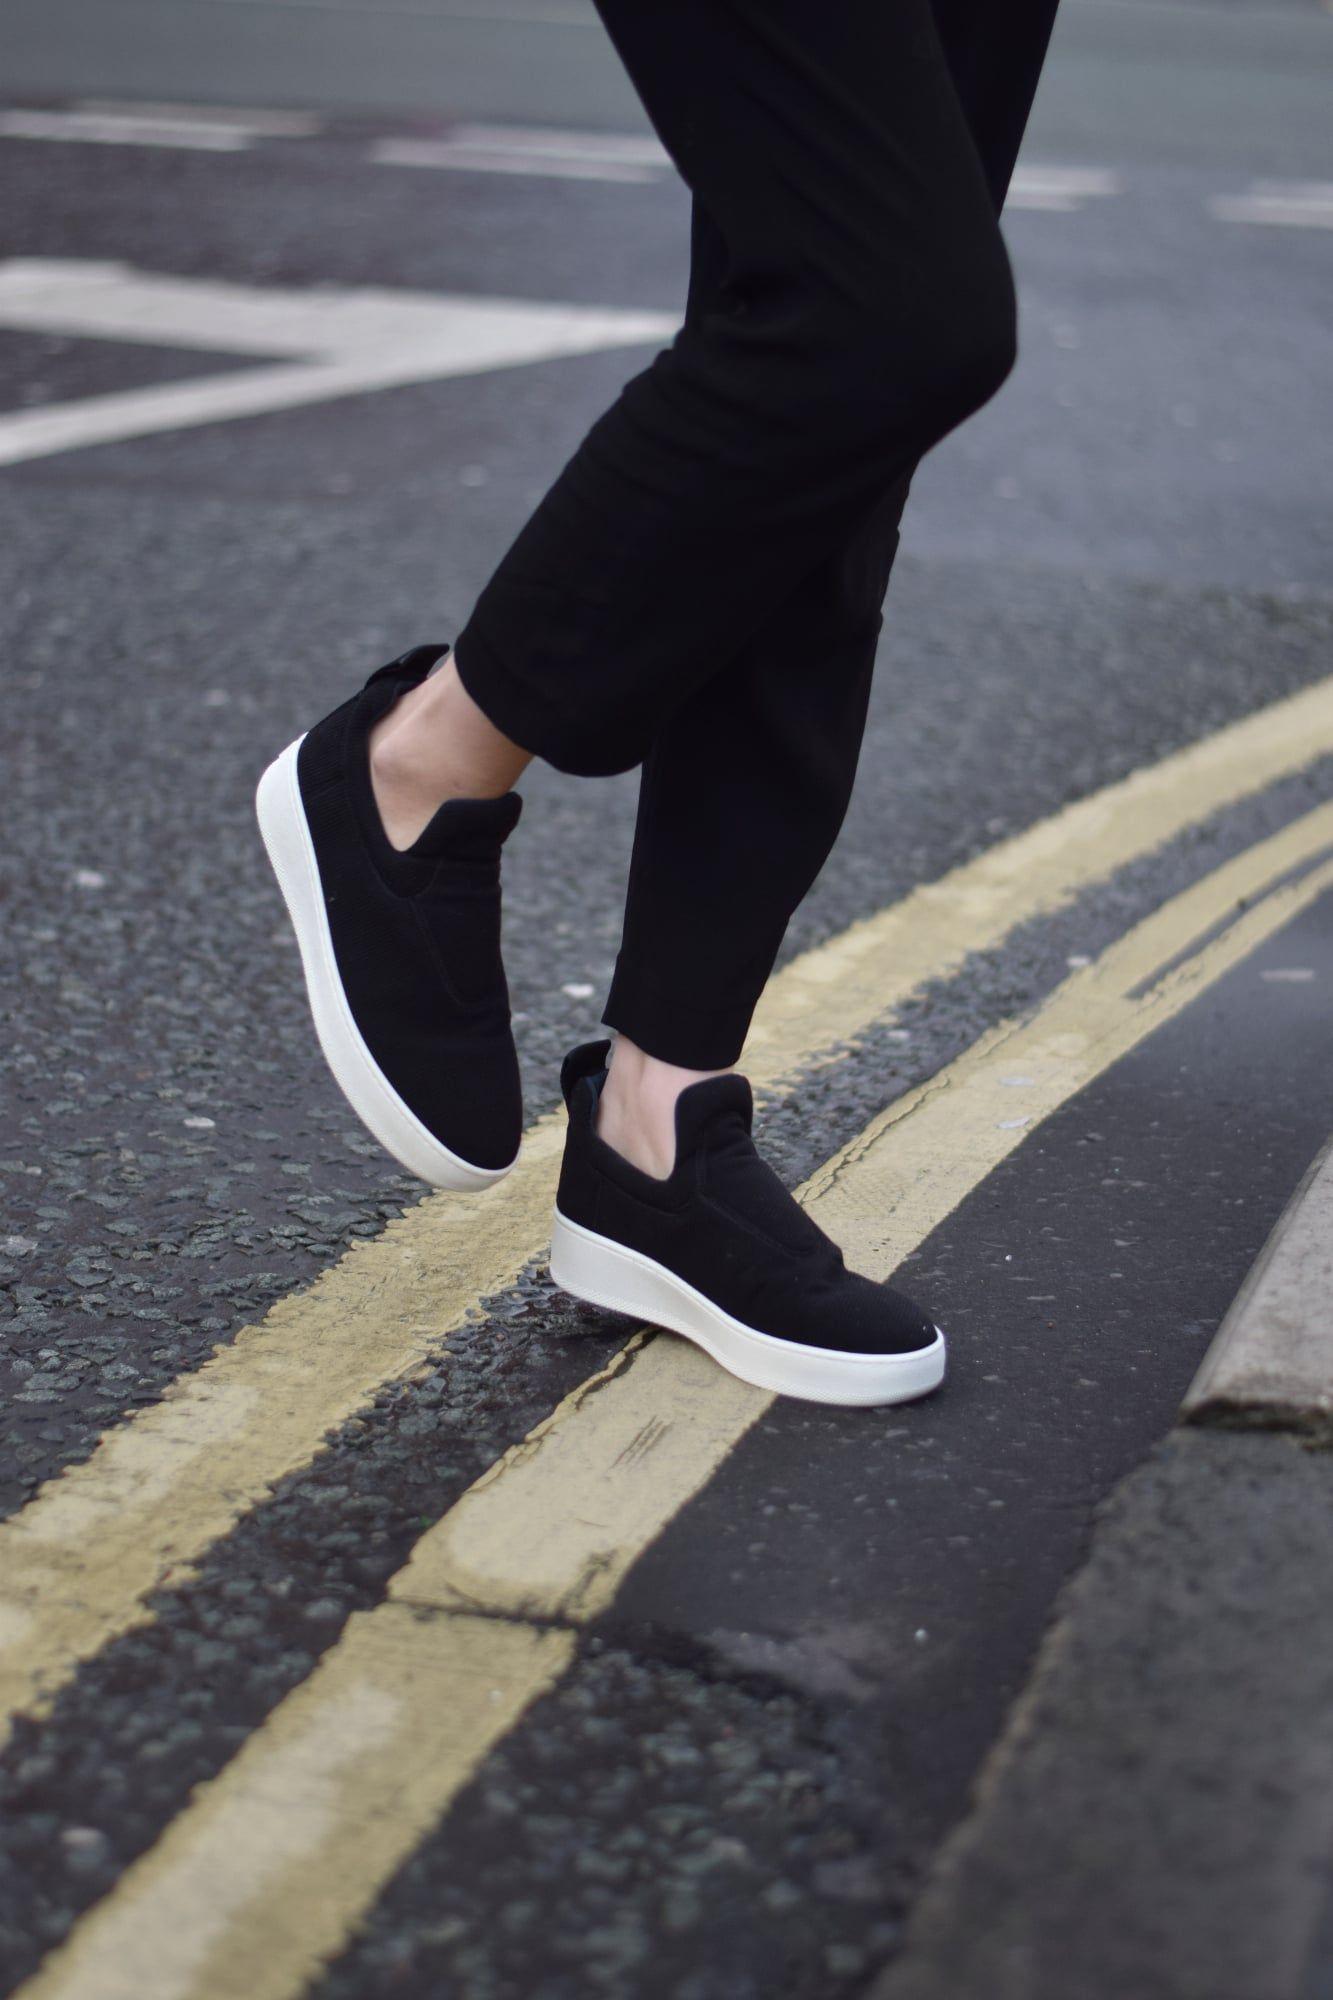 www.shotfromthestreet.com - so in love with my Celine slip on sneakers! 26dfd7aee